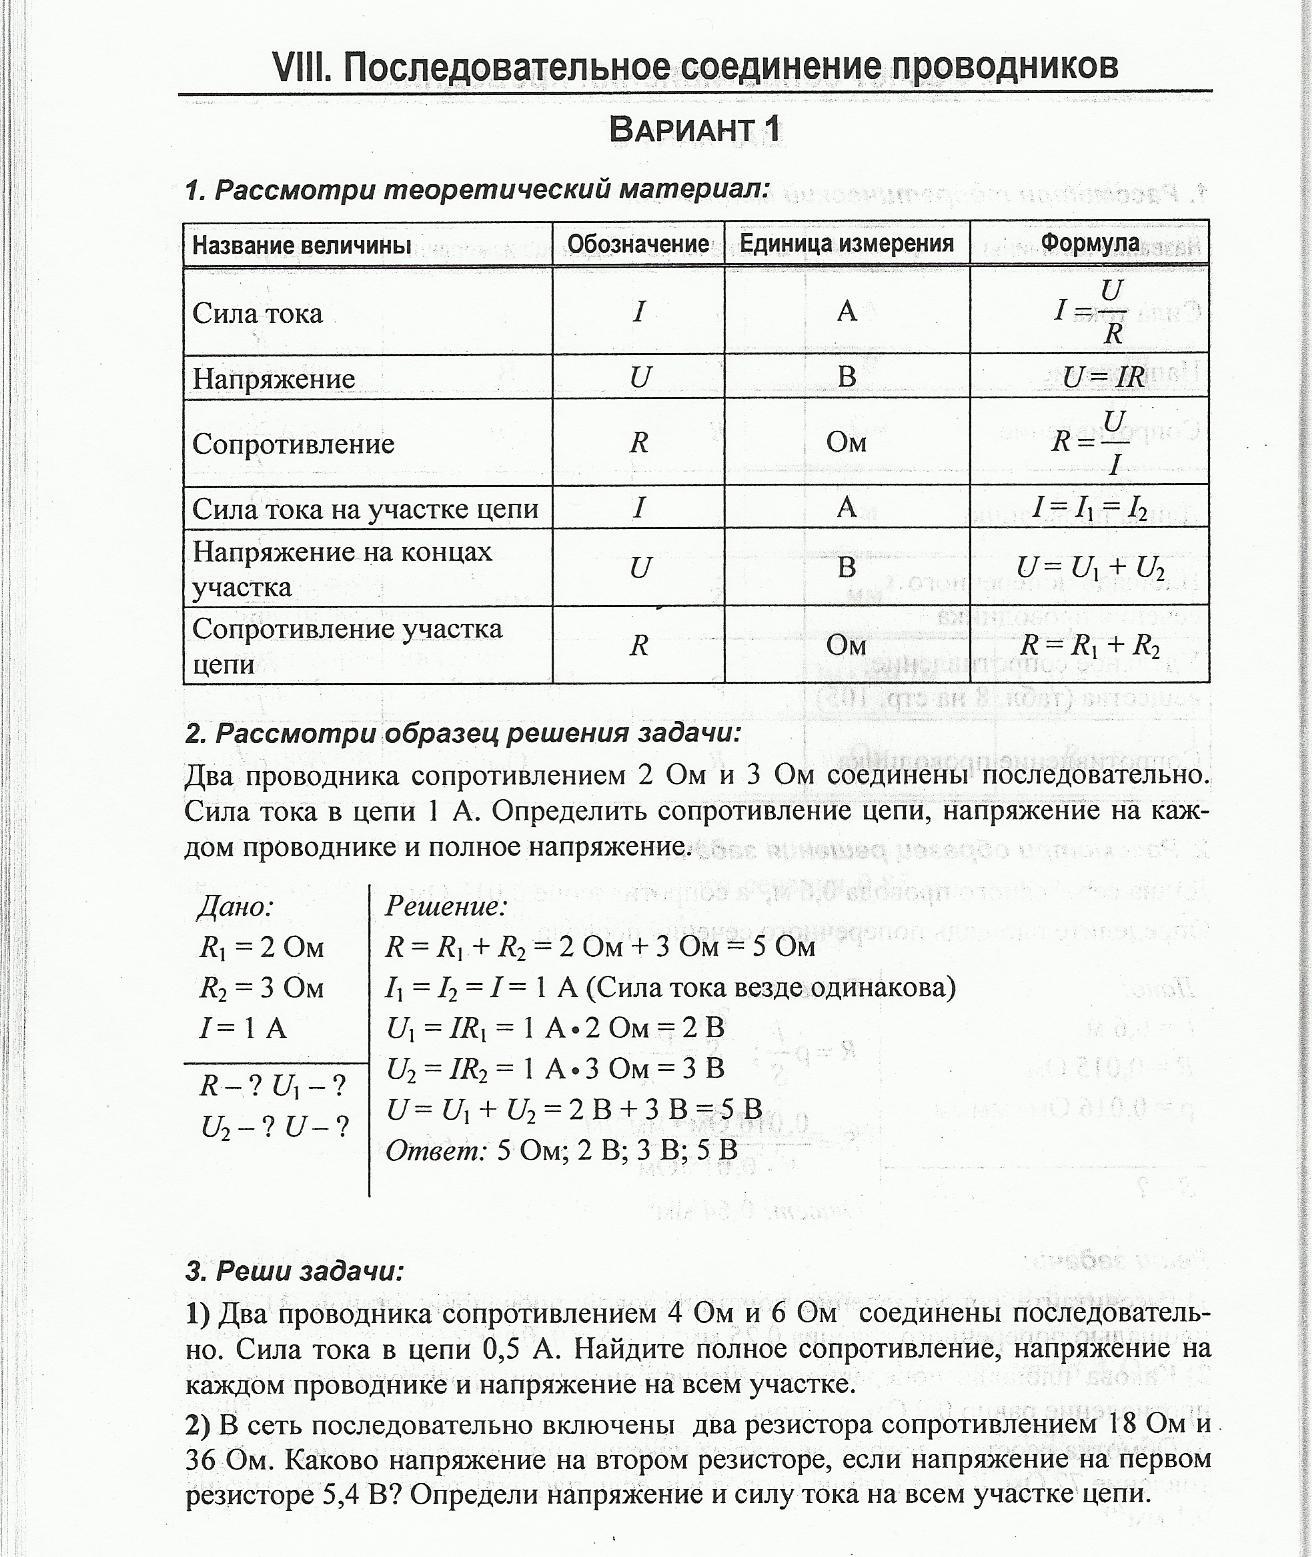 C:\Documents and Settings\руфина\Рабочий стол\сертиф2\Scaв1.jpg